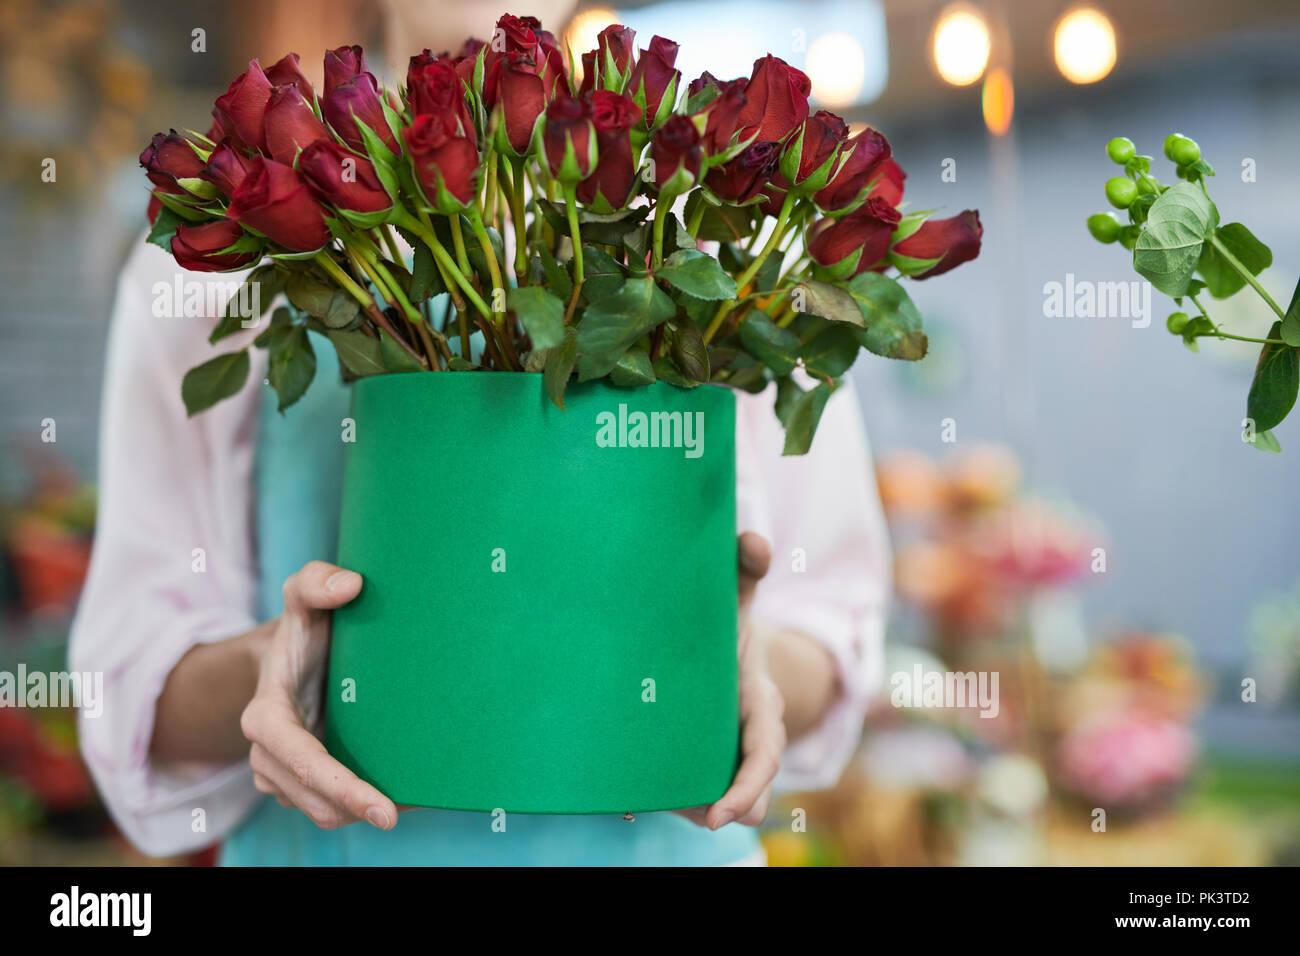 Celebración de Floristería Rosas Foto de stock